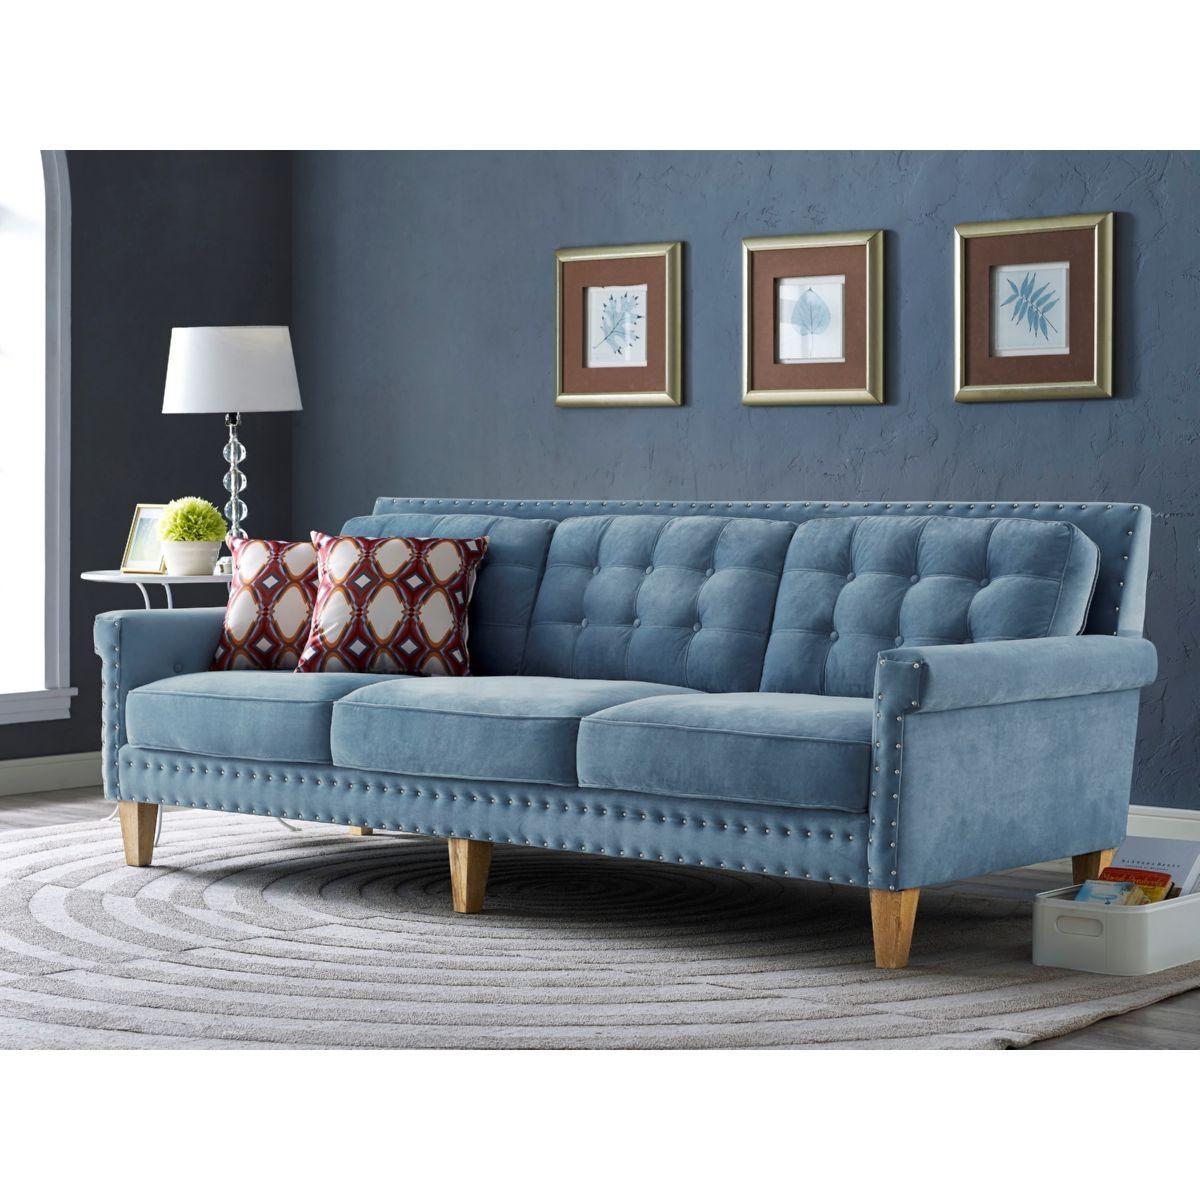 Tov Furniture Tov S75 Jonathan Tufted Blue Velvet Sofa W/ Silver For Blue Tufted Sofas (View 21 of 22)